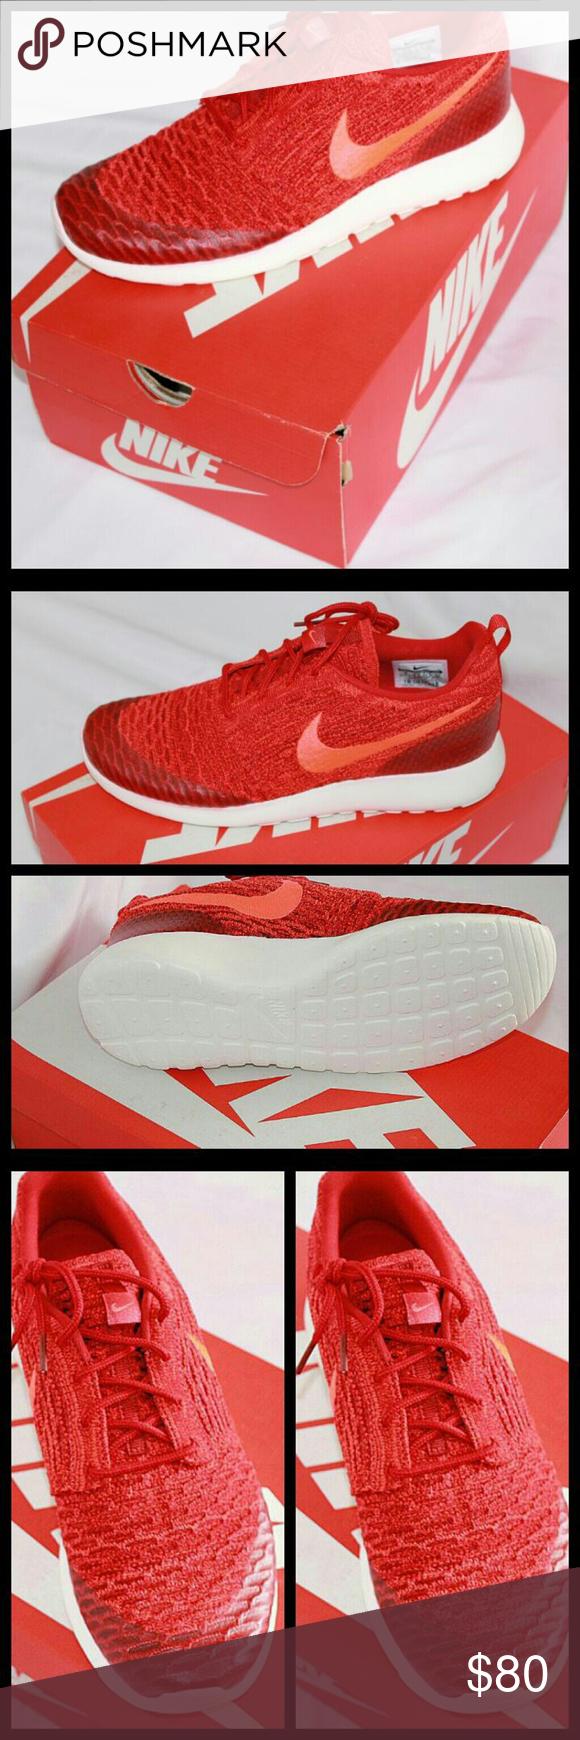 New Nike Roshe One Flyknit 704927 601 New in box Never worn